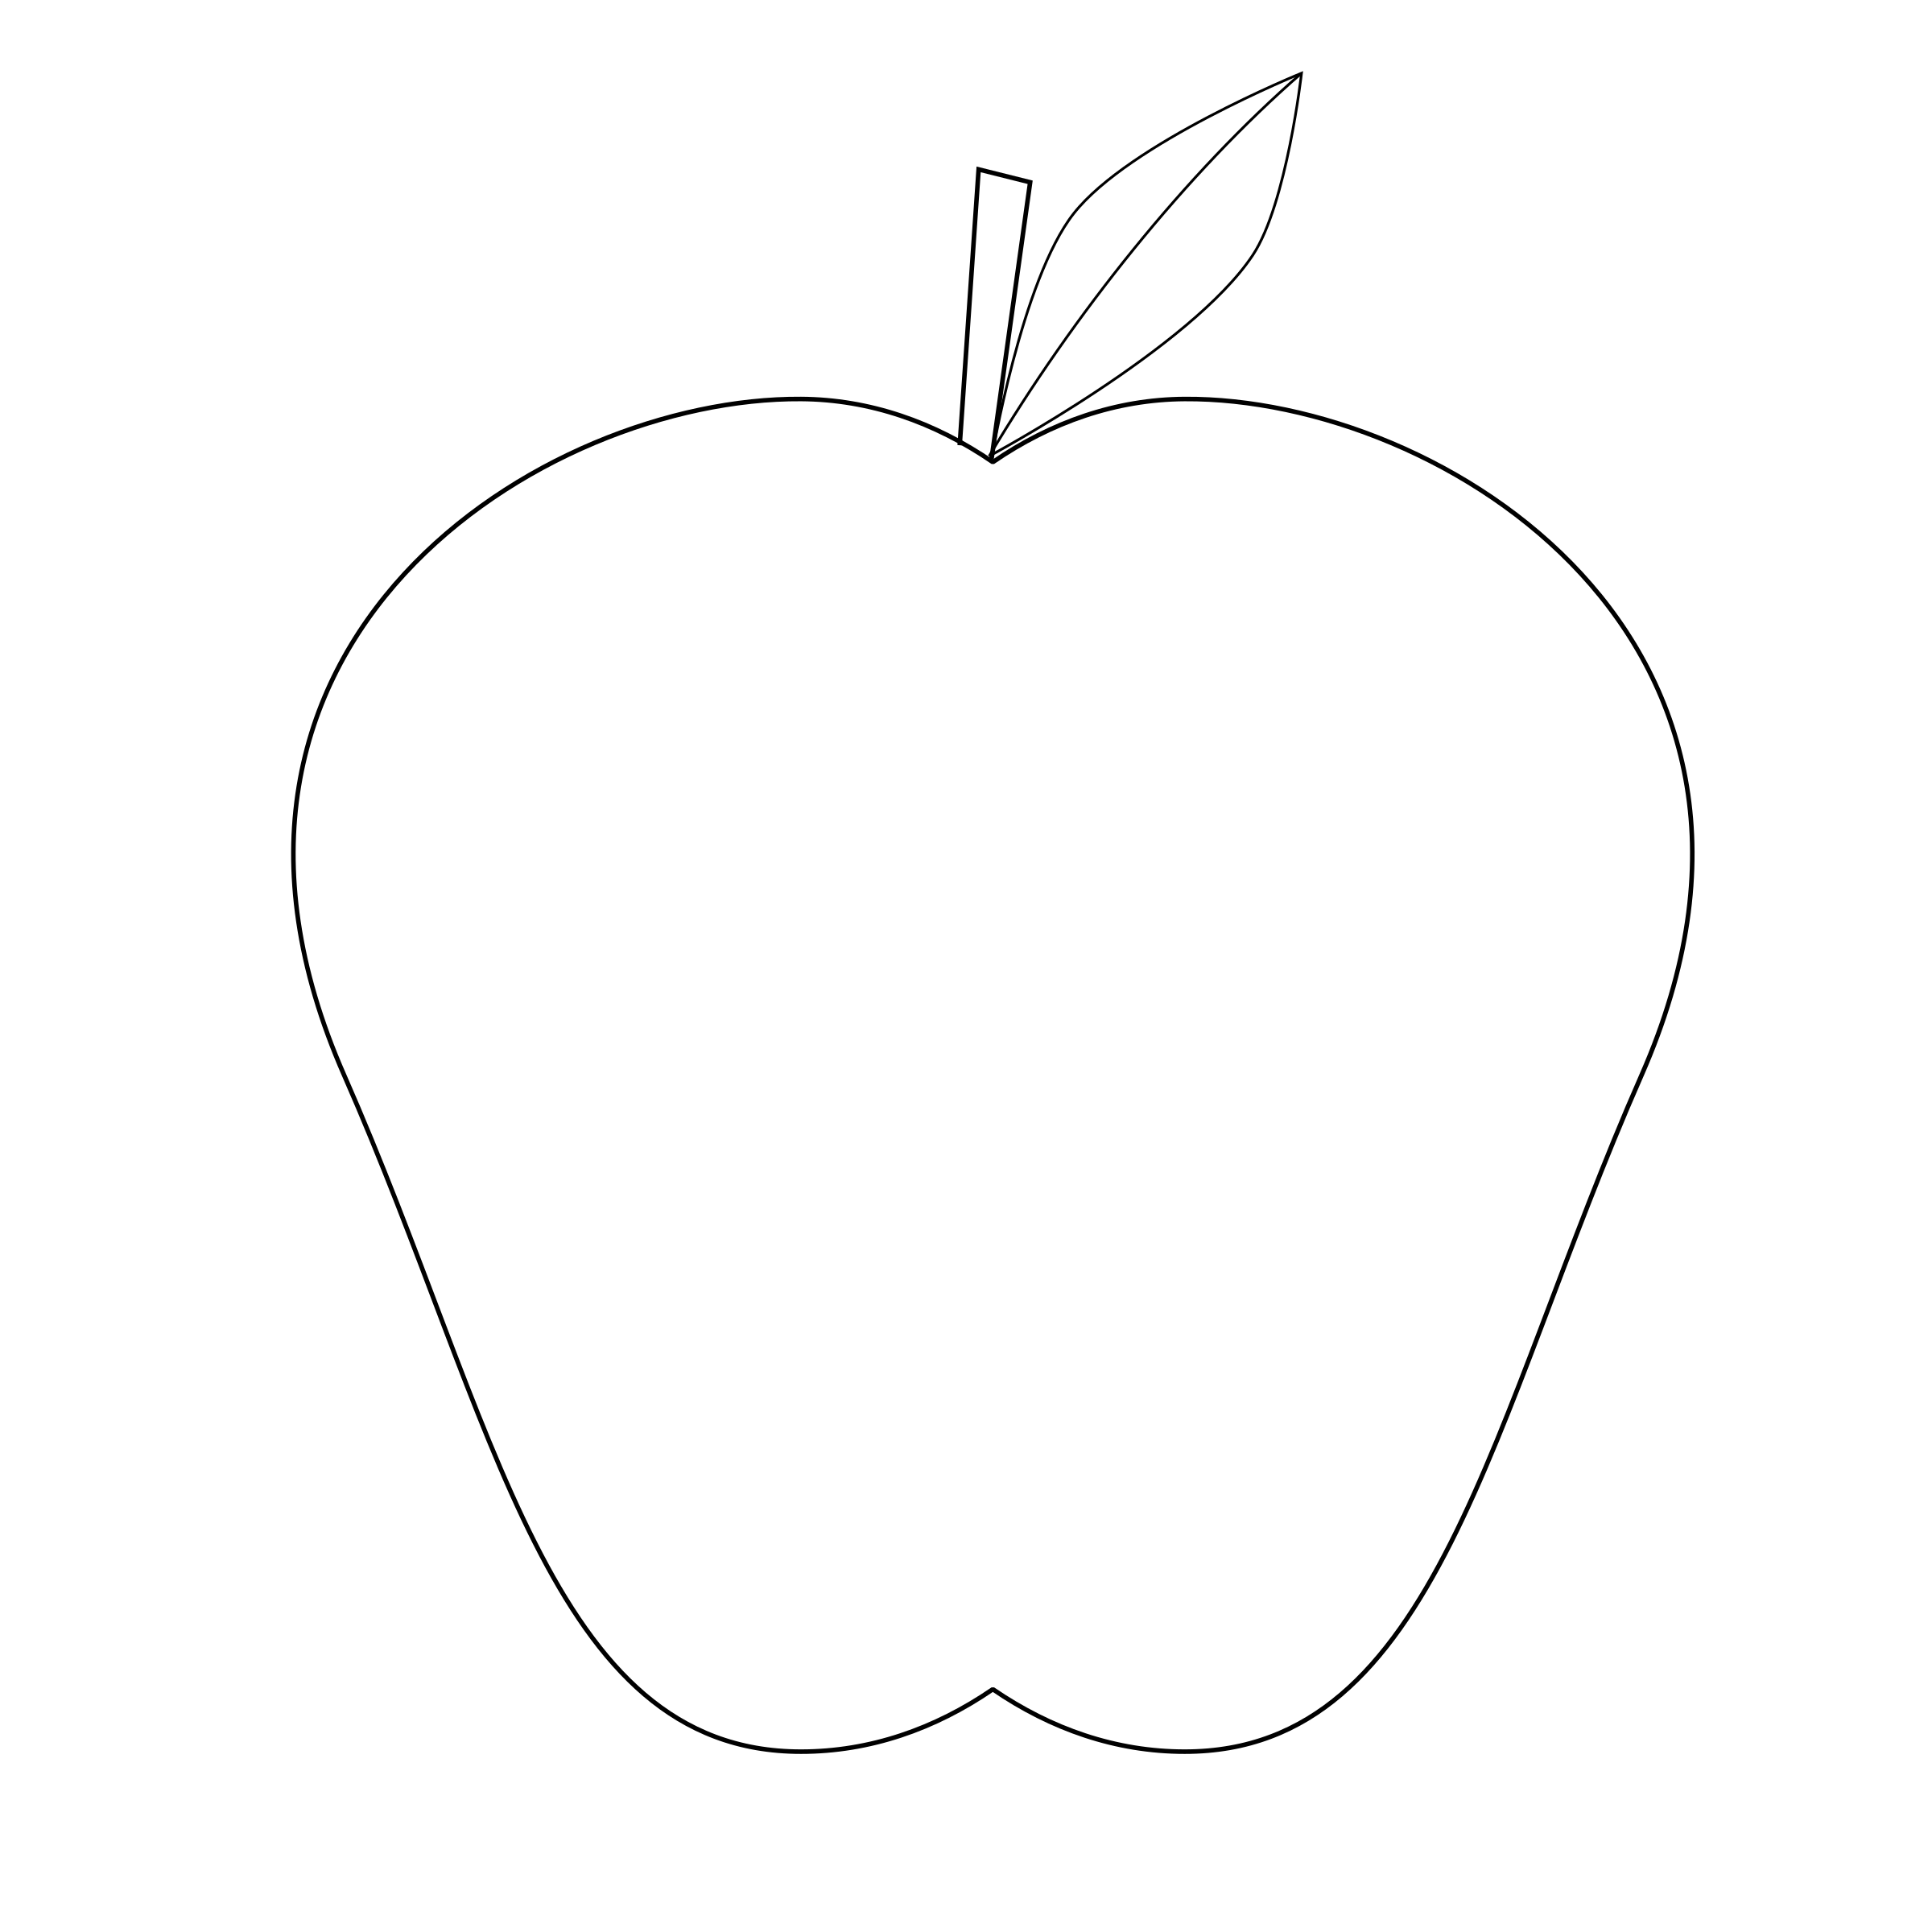 Big image png. Clipart apple outline